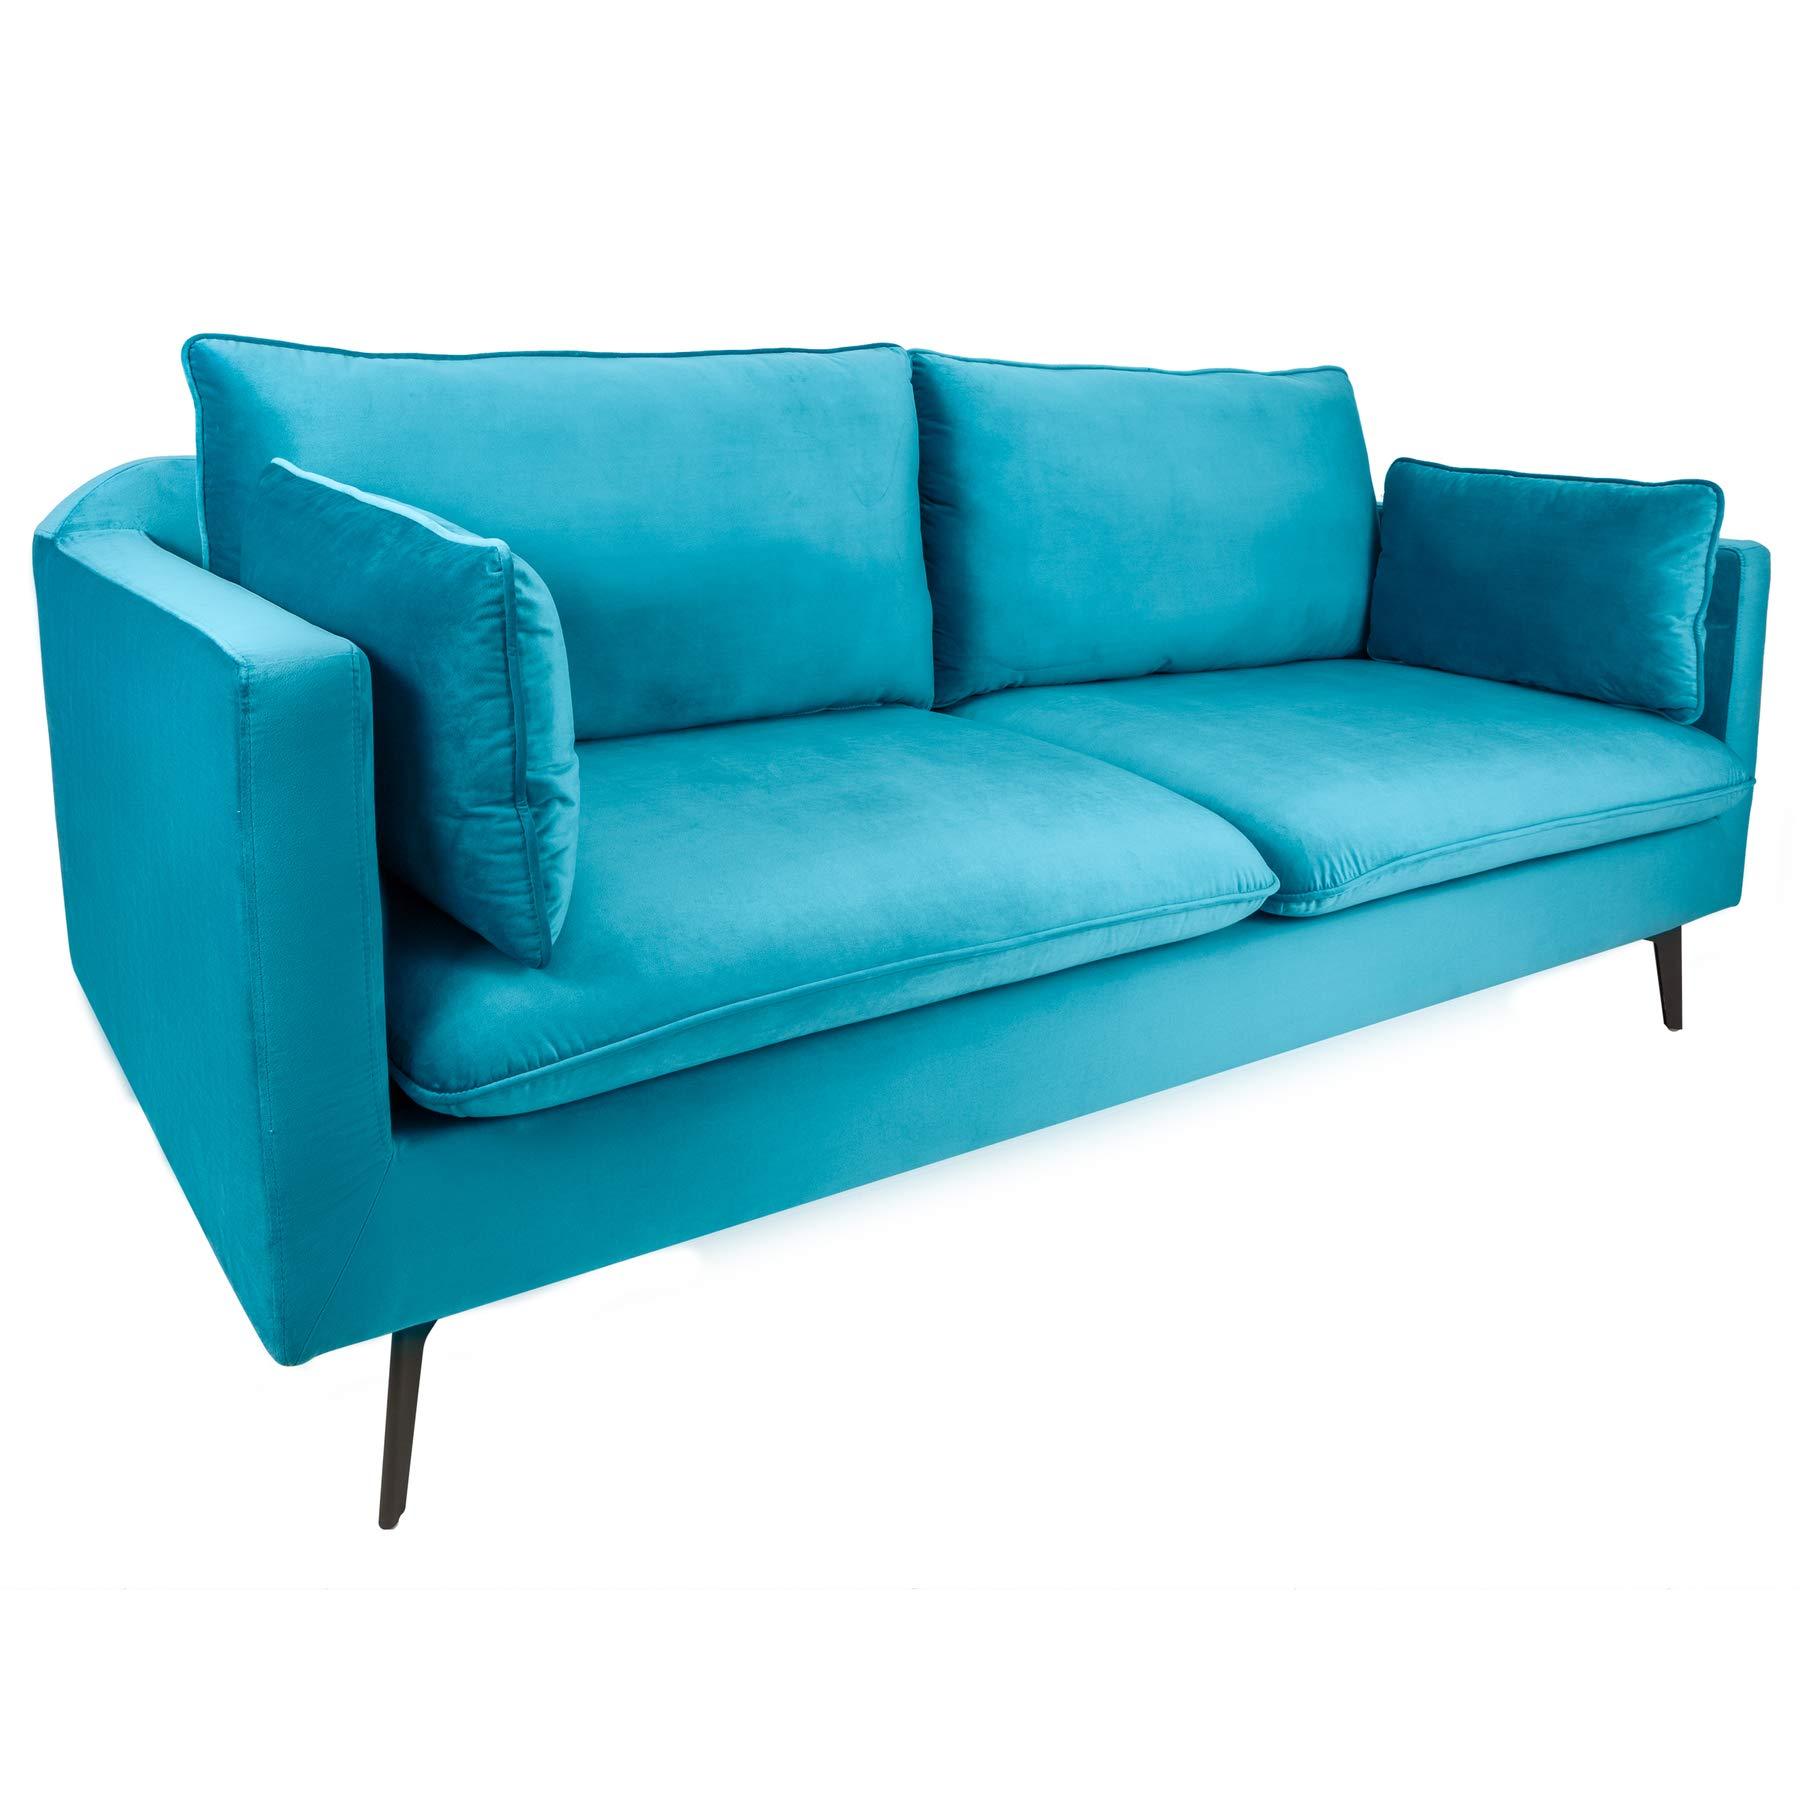 Full Size of Federkern Sofa Ikea Selbst Reparieren Zu Hart Durchgesessen Quietscht Reparatur Bonell Gut Oder Schlecht Was Ist Das Riess Ambiente Design 3er Famous Aqua Blau Sofa Federkern Sofa